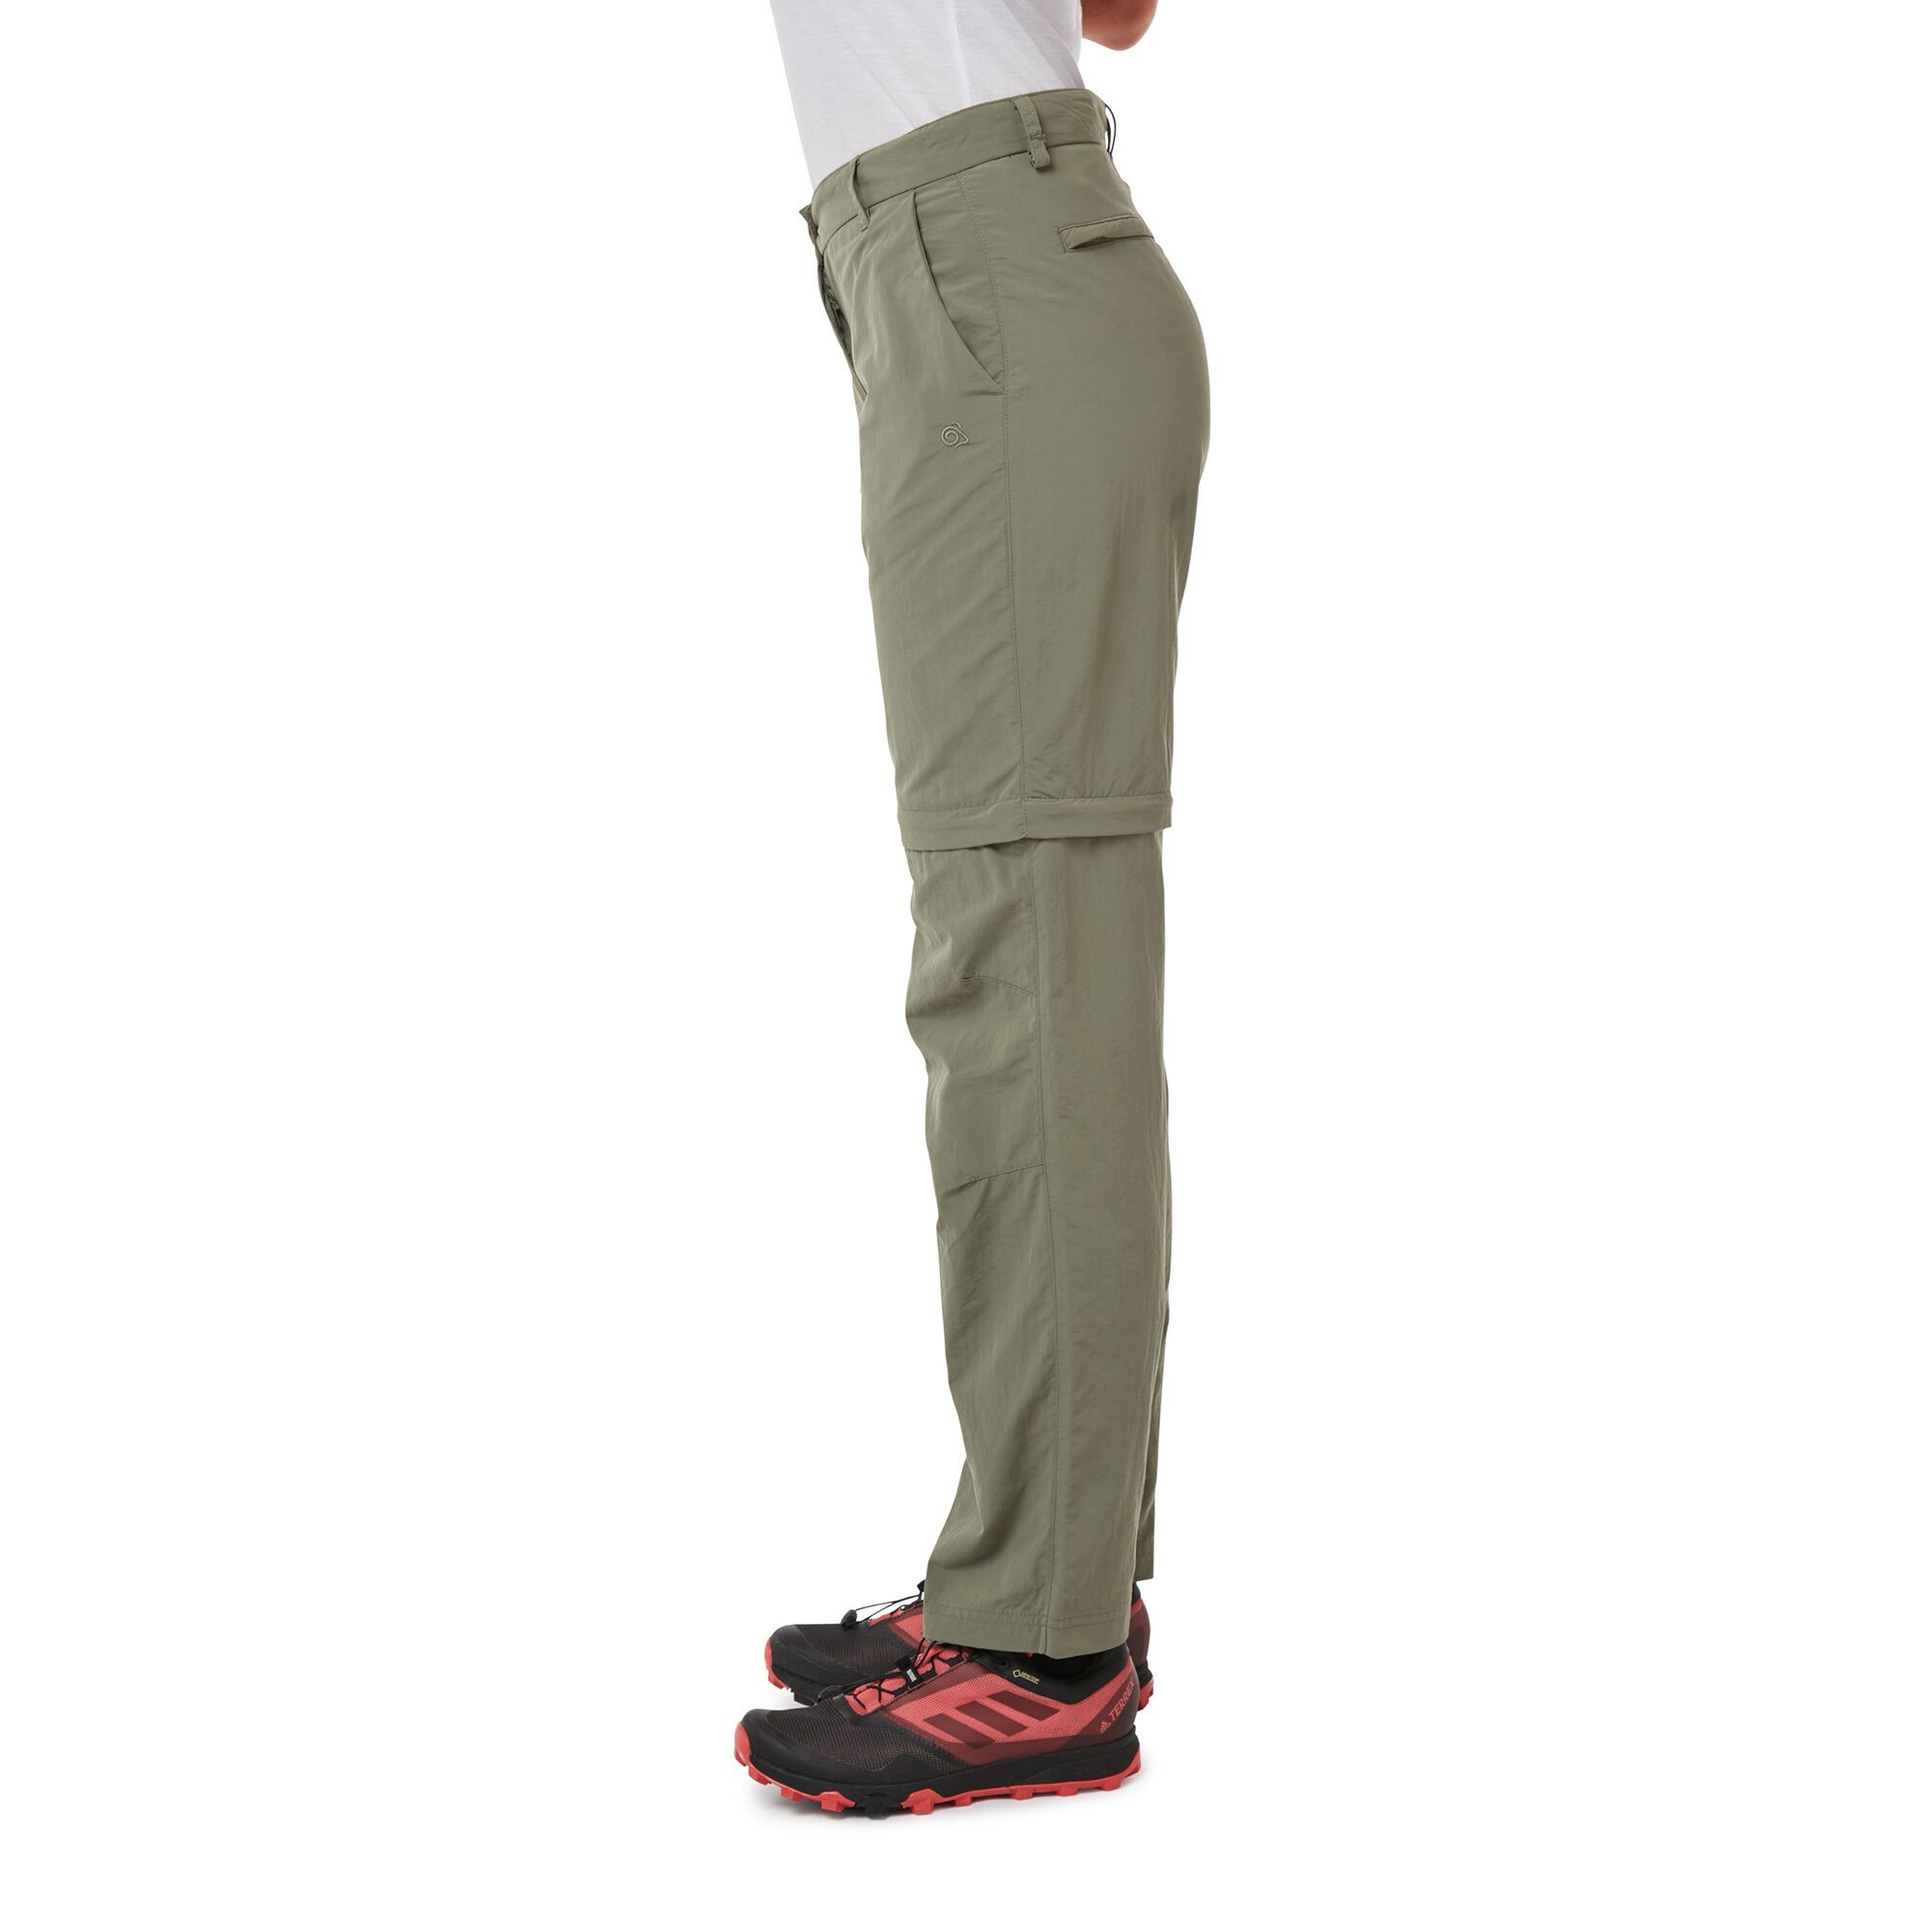 Craghoppers-Pantalon-CONVERTIBLE-Femme-CG1098 miniature 9